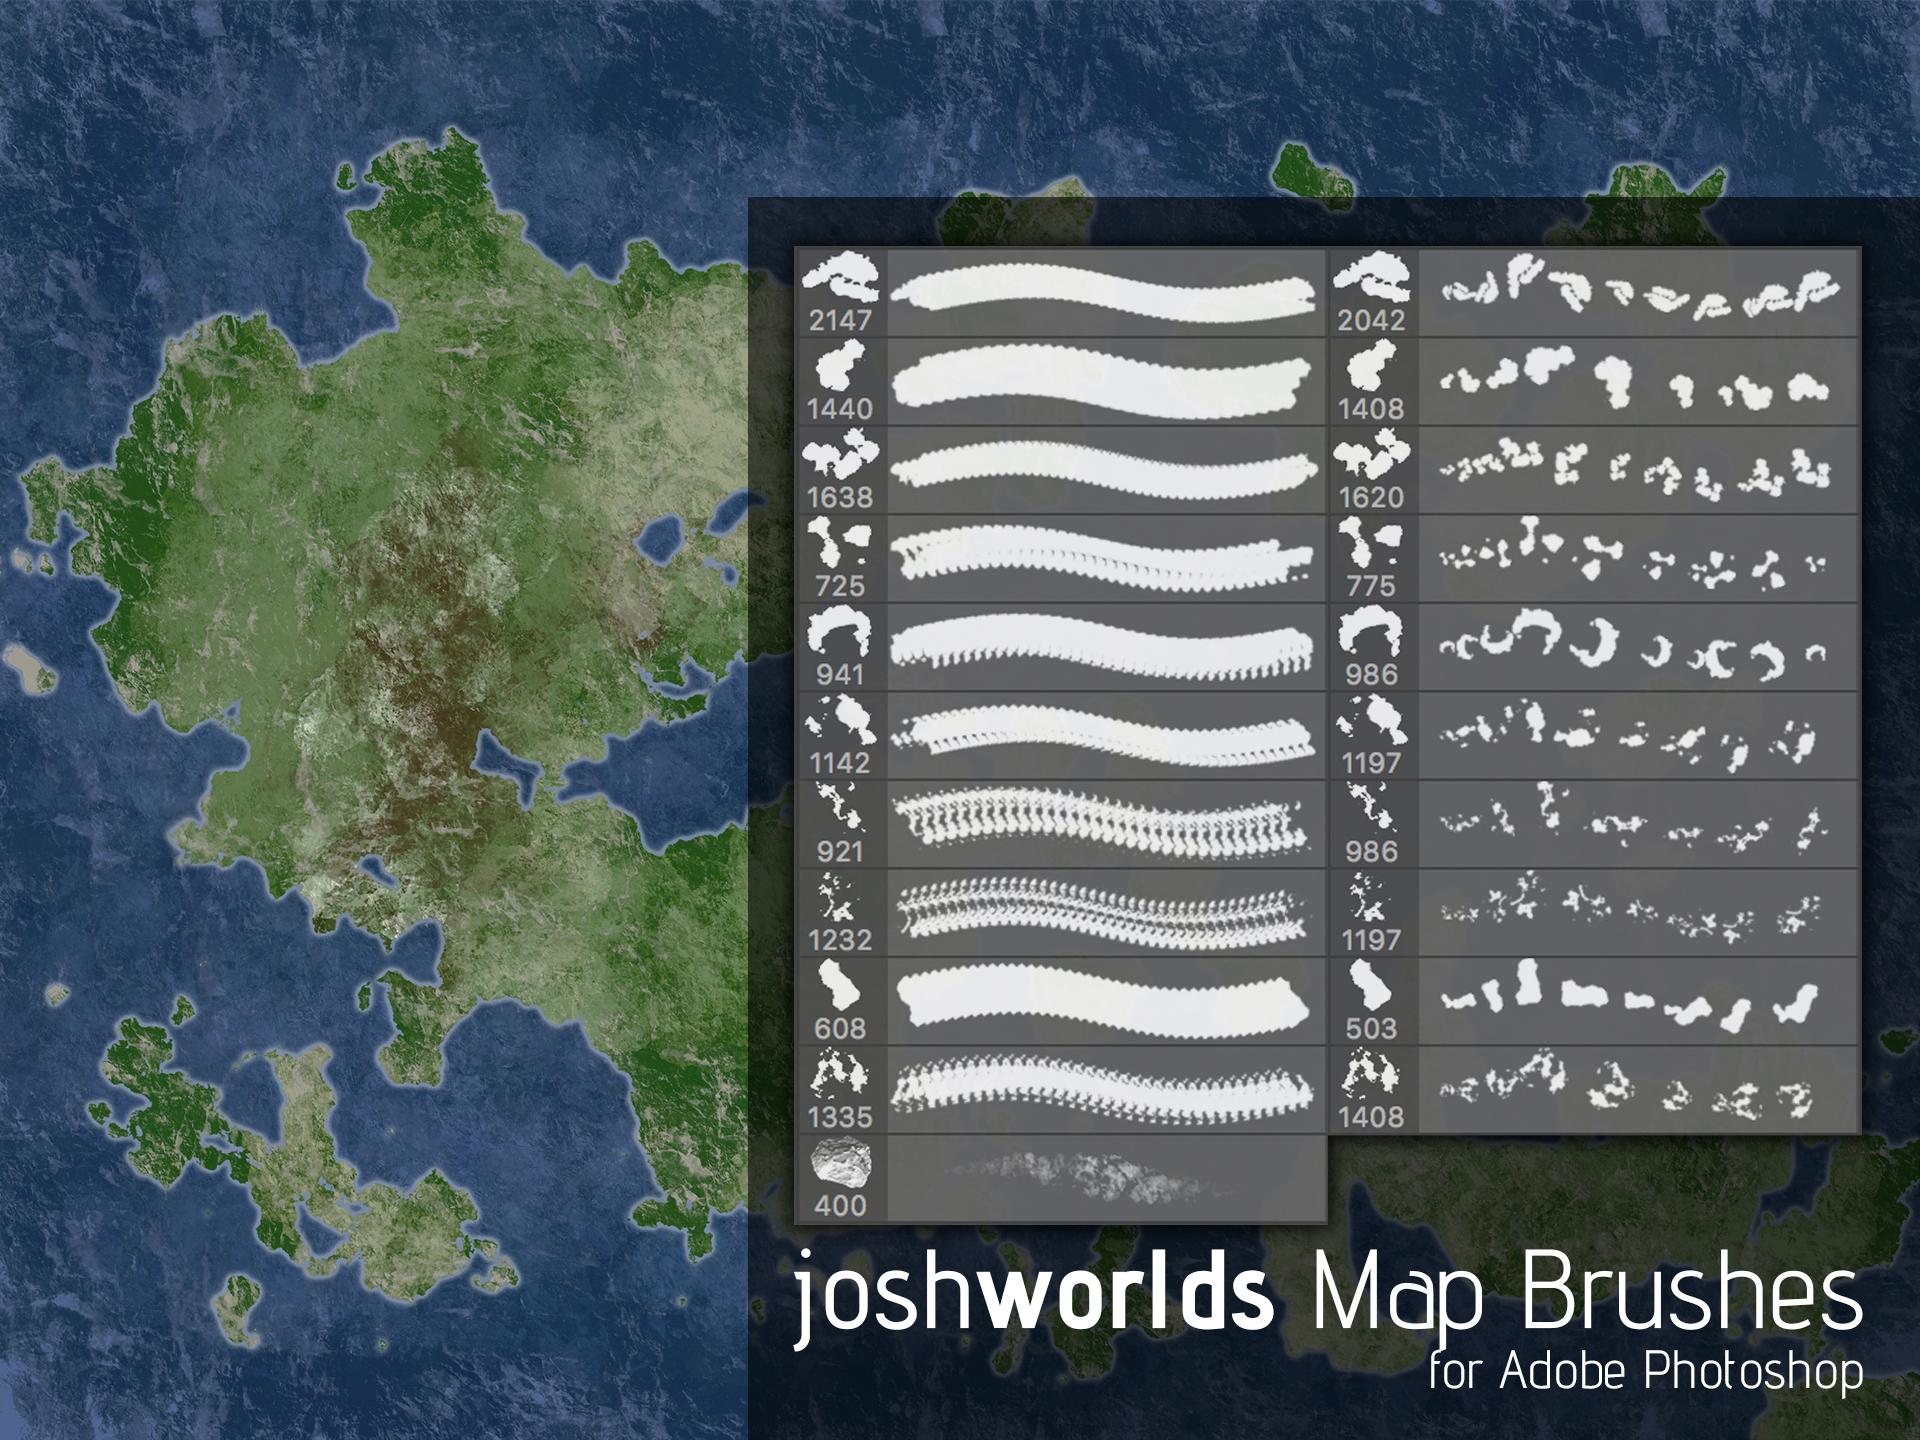 Map/Land Mass Brushes by JoshWorlds by JoshWorlds